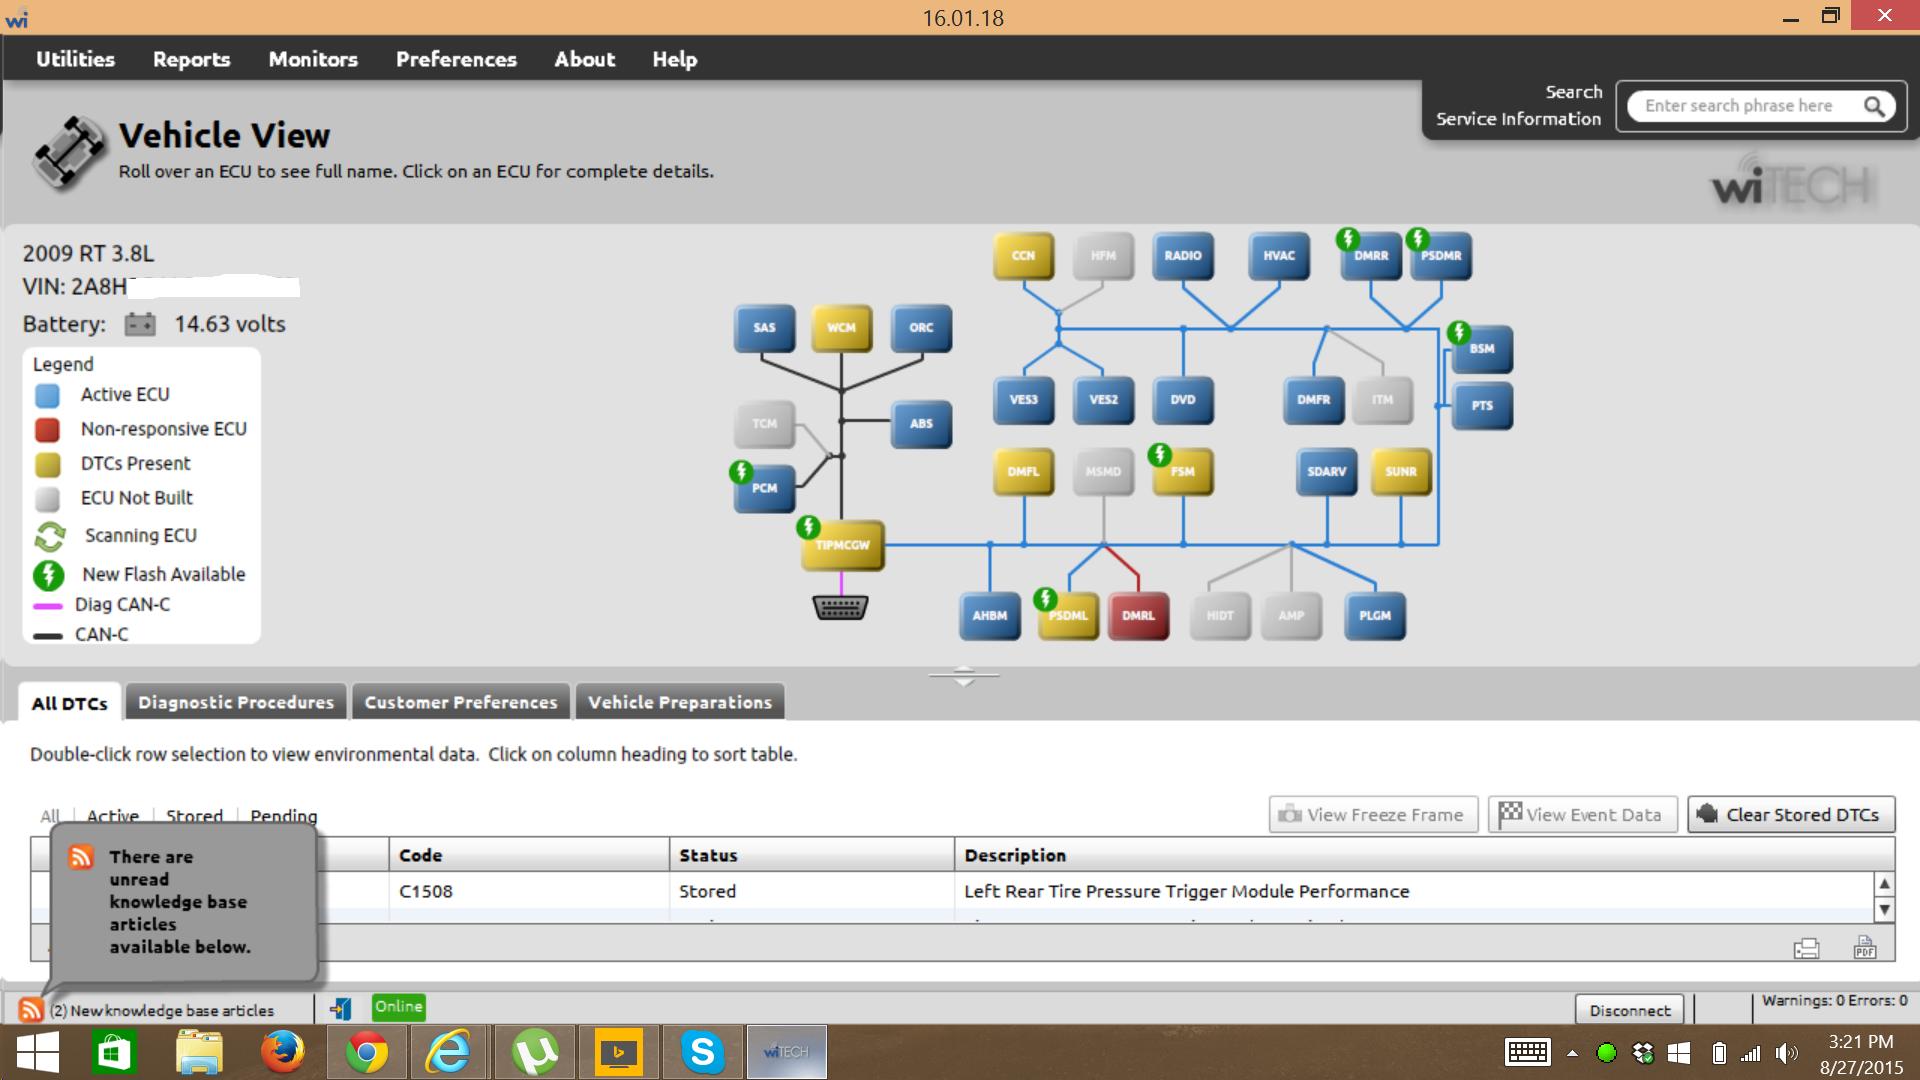 5770fcf2-5df2-4d19-b1b9-d0f21ece7617_WiTech Topography screenshot.png